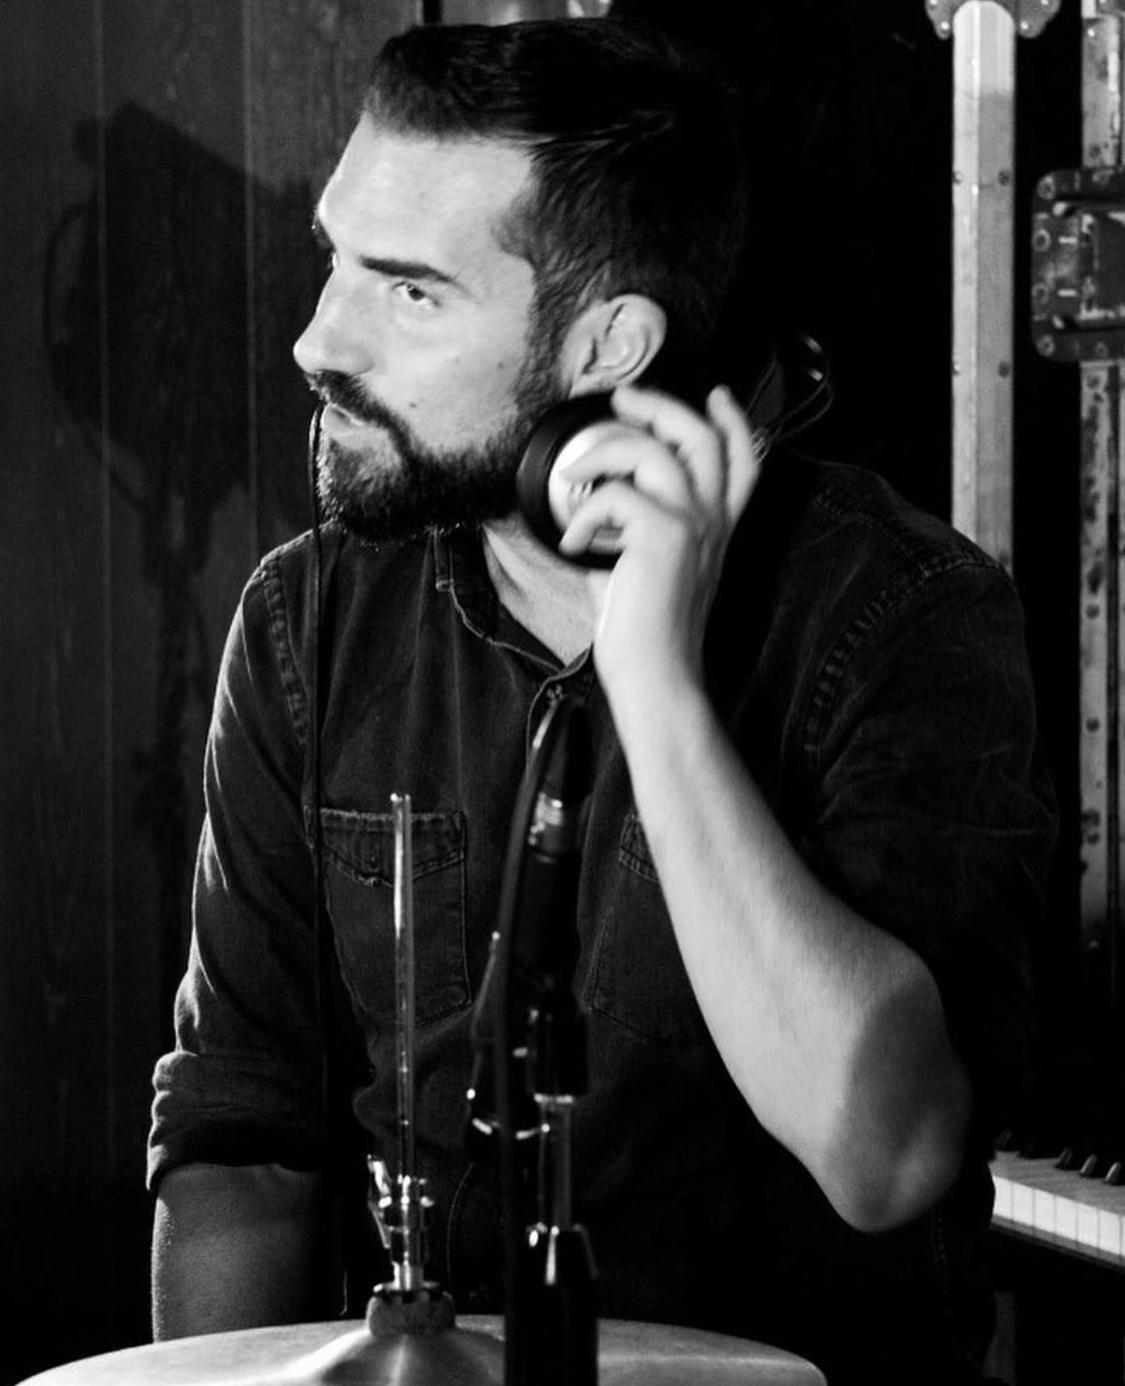 Intervista al giovane batterista-musicista: Gianluca Brugnano